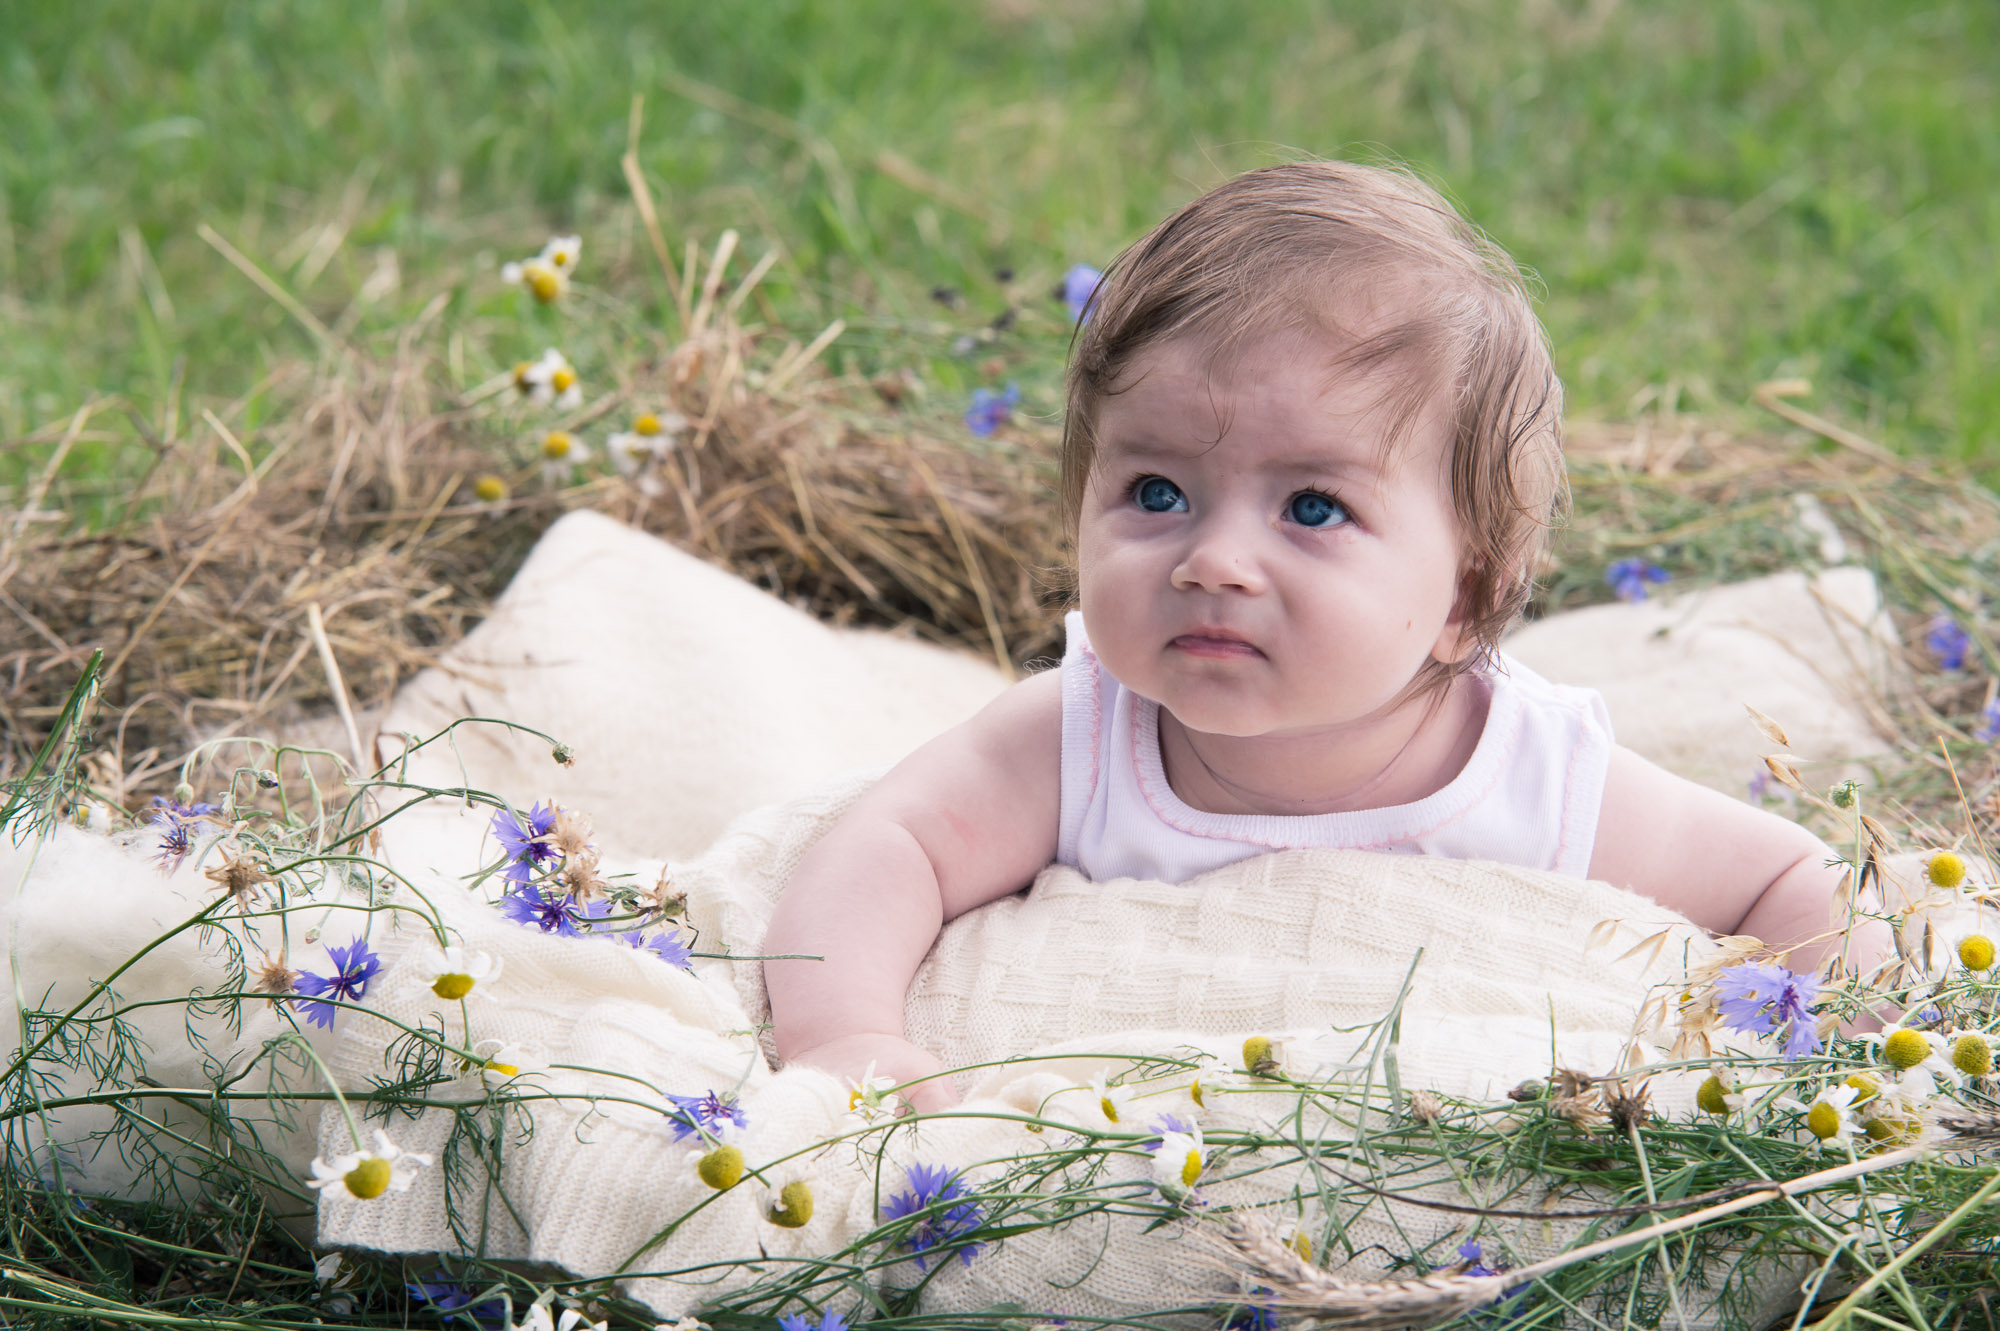 Baby B2000 9917 - Strickroth & Fiege Fotografie